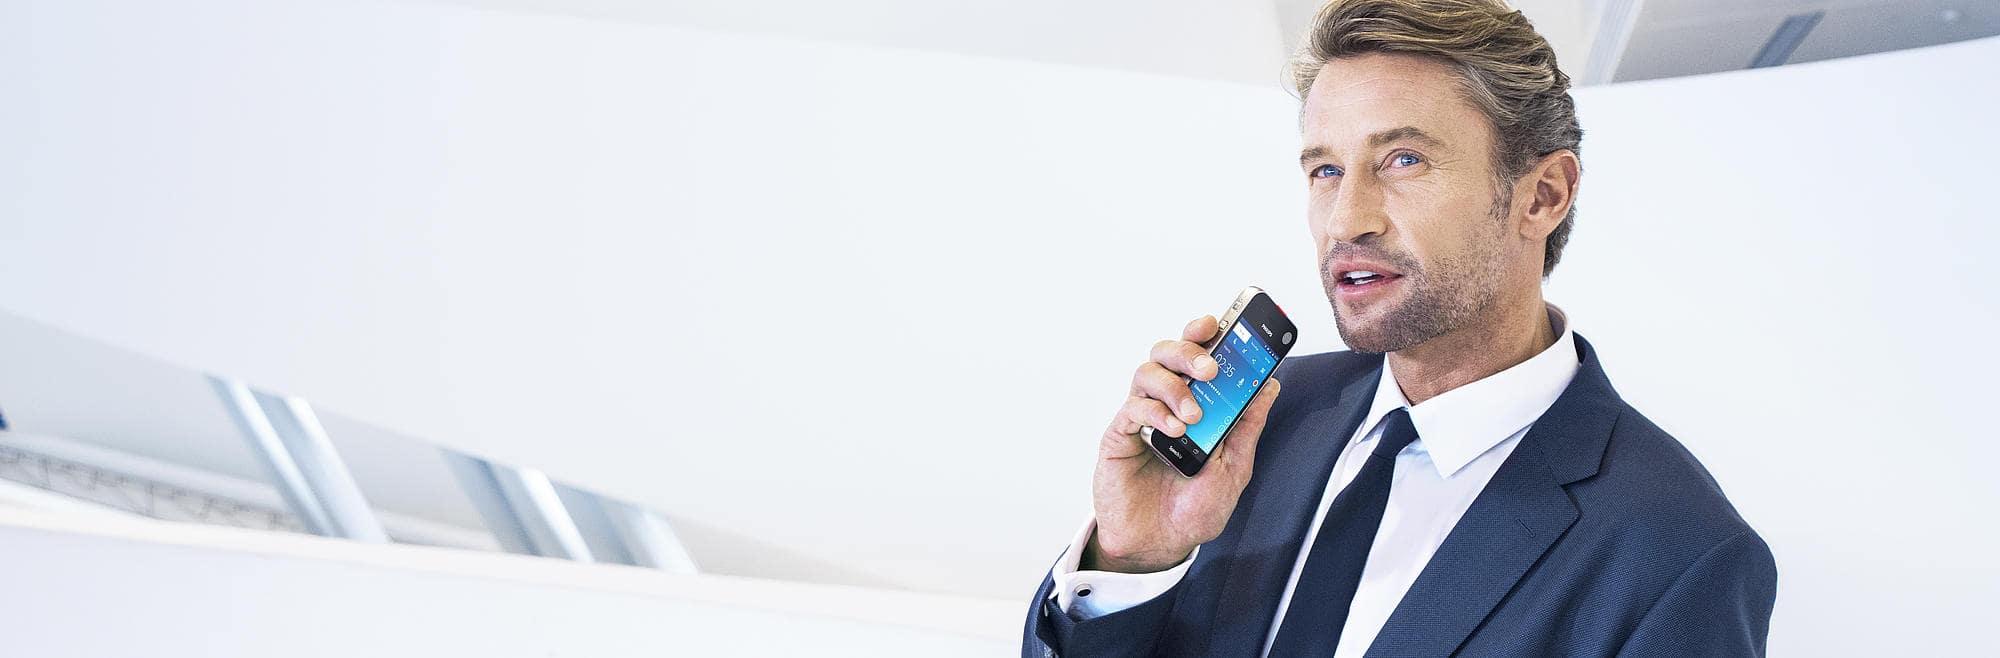 voice recorder smartphone